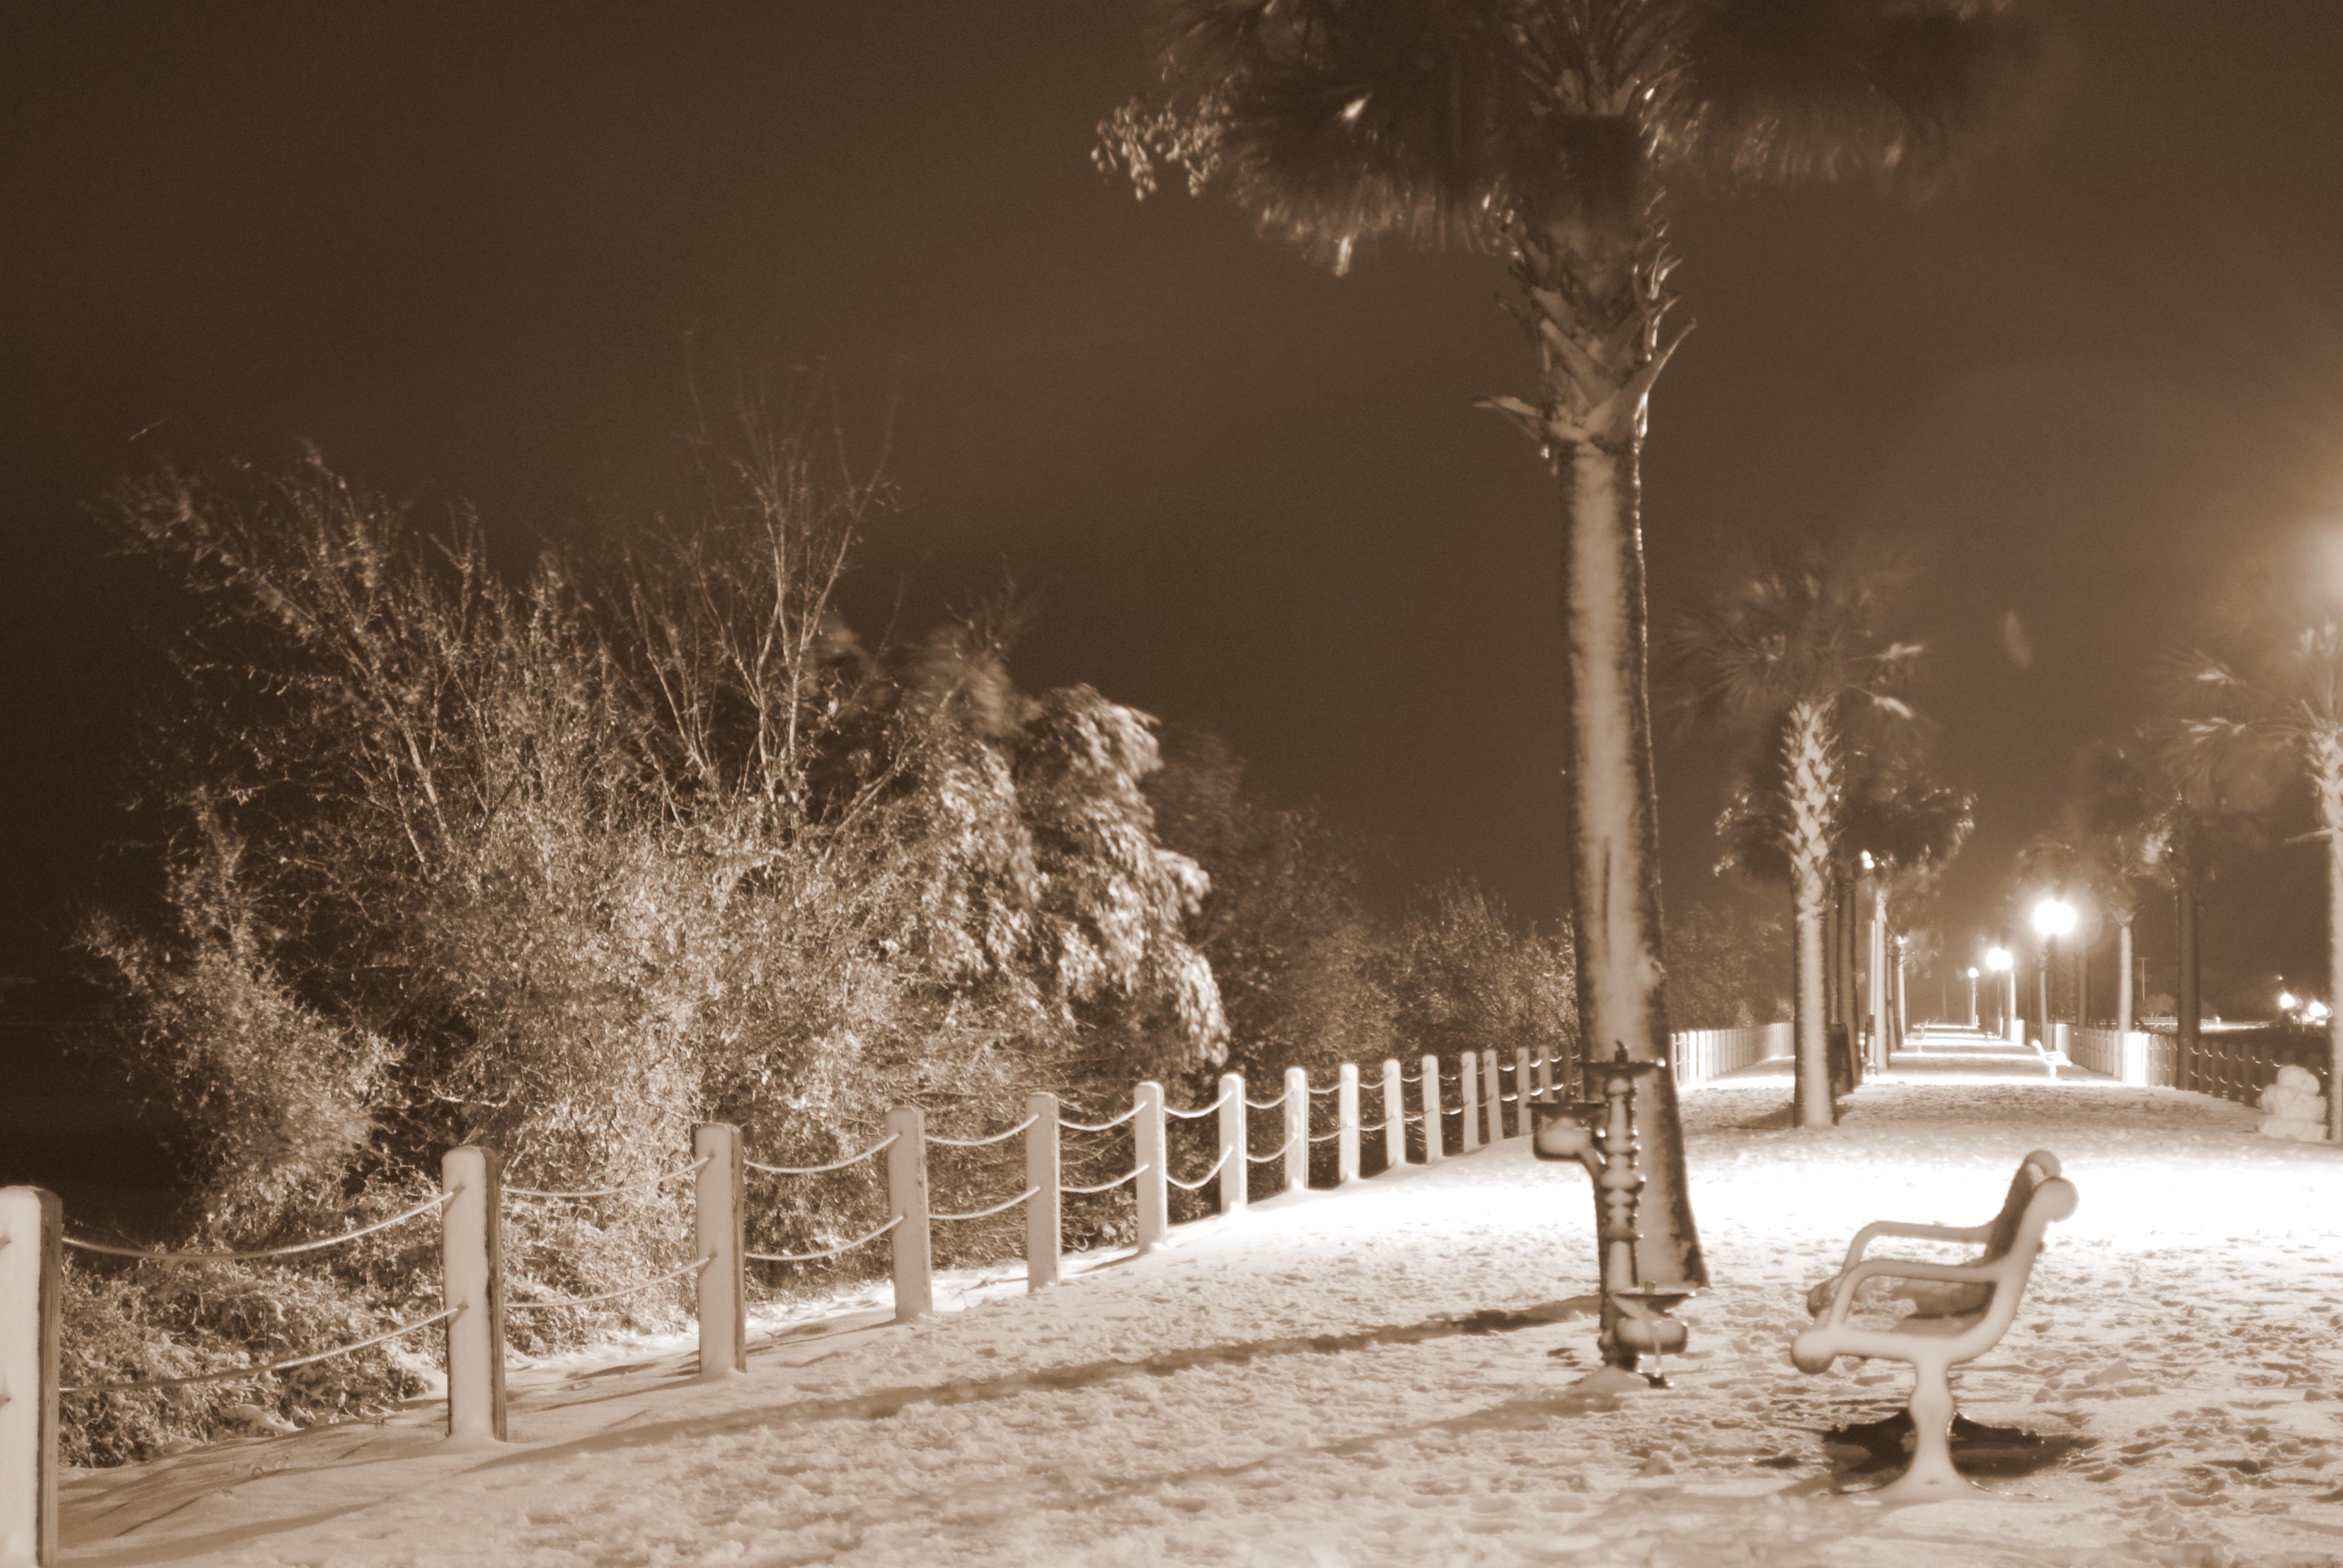 Sepia Scenes of Snow in South Carolina!